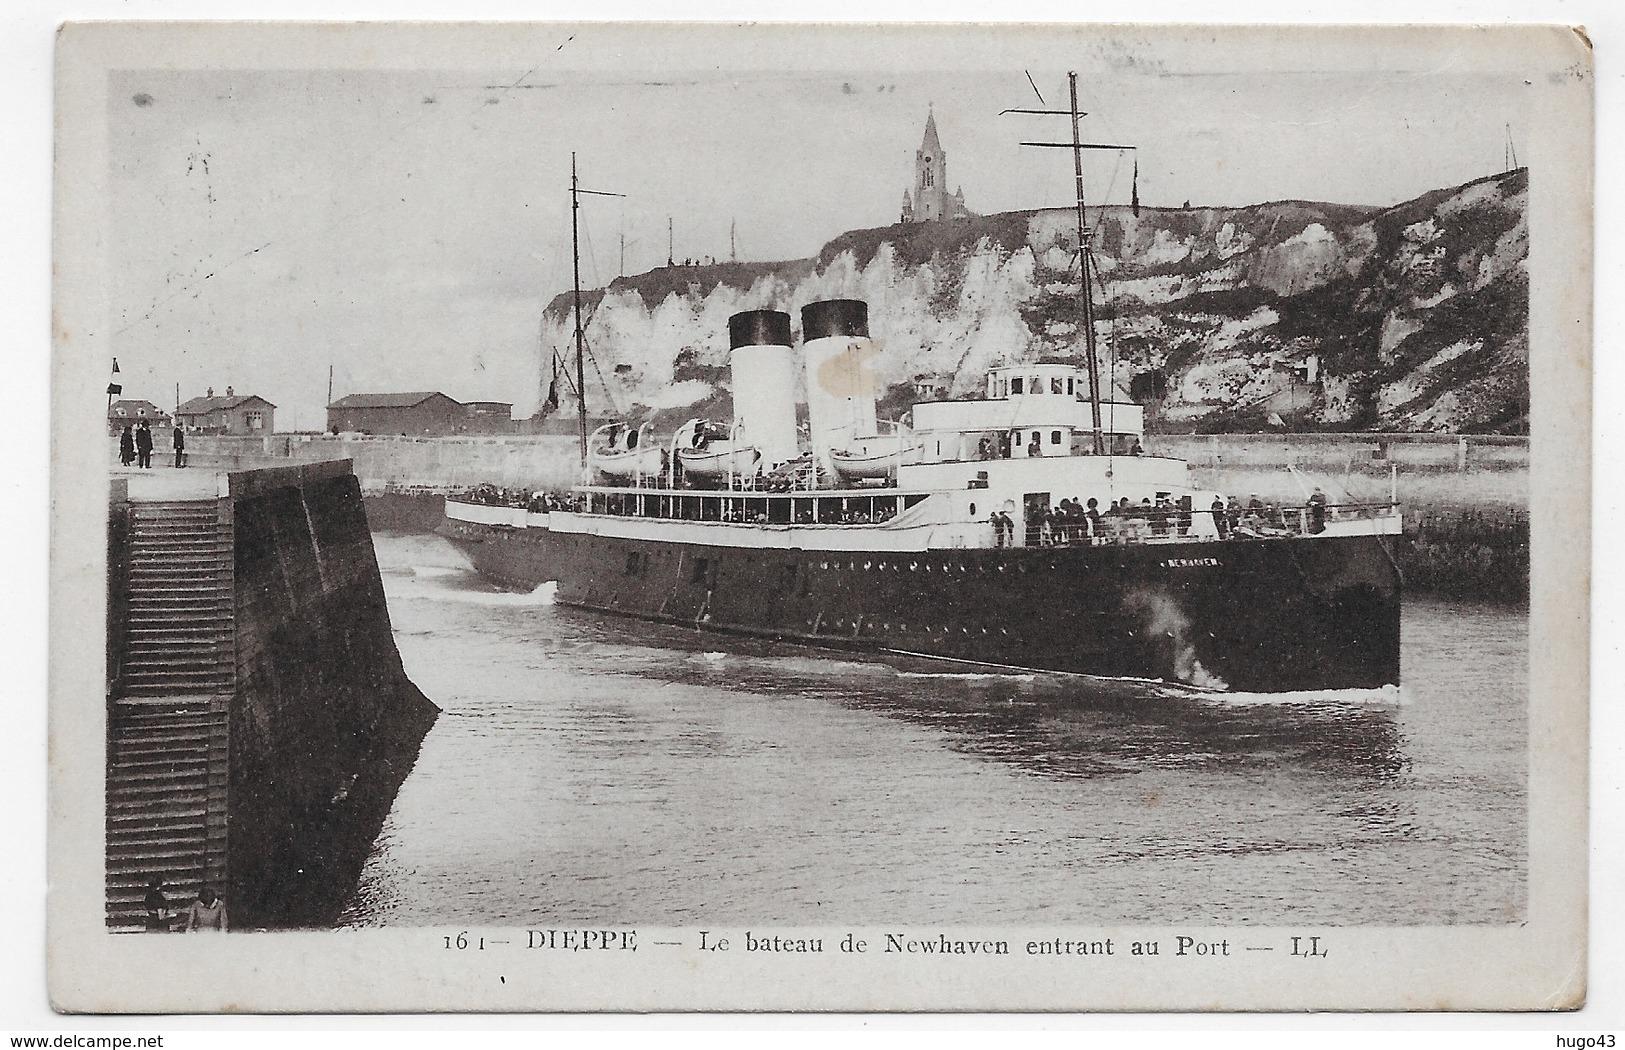 (RECTO / VERSO) DIEPPE - N° 161 - LE NEWHAVEN ENTRANT AU PORT - CPA VOYAGEE - 76 - Ferries